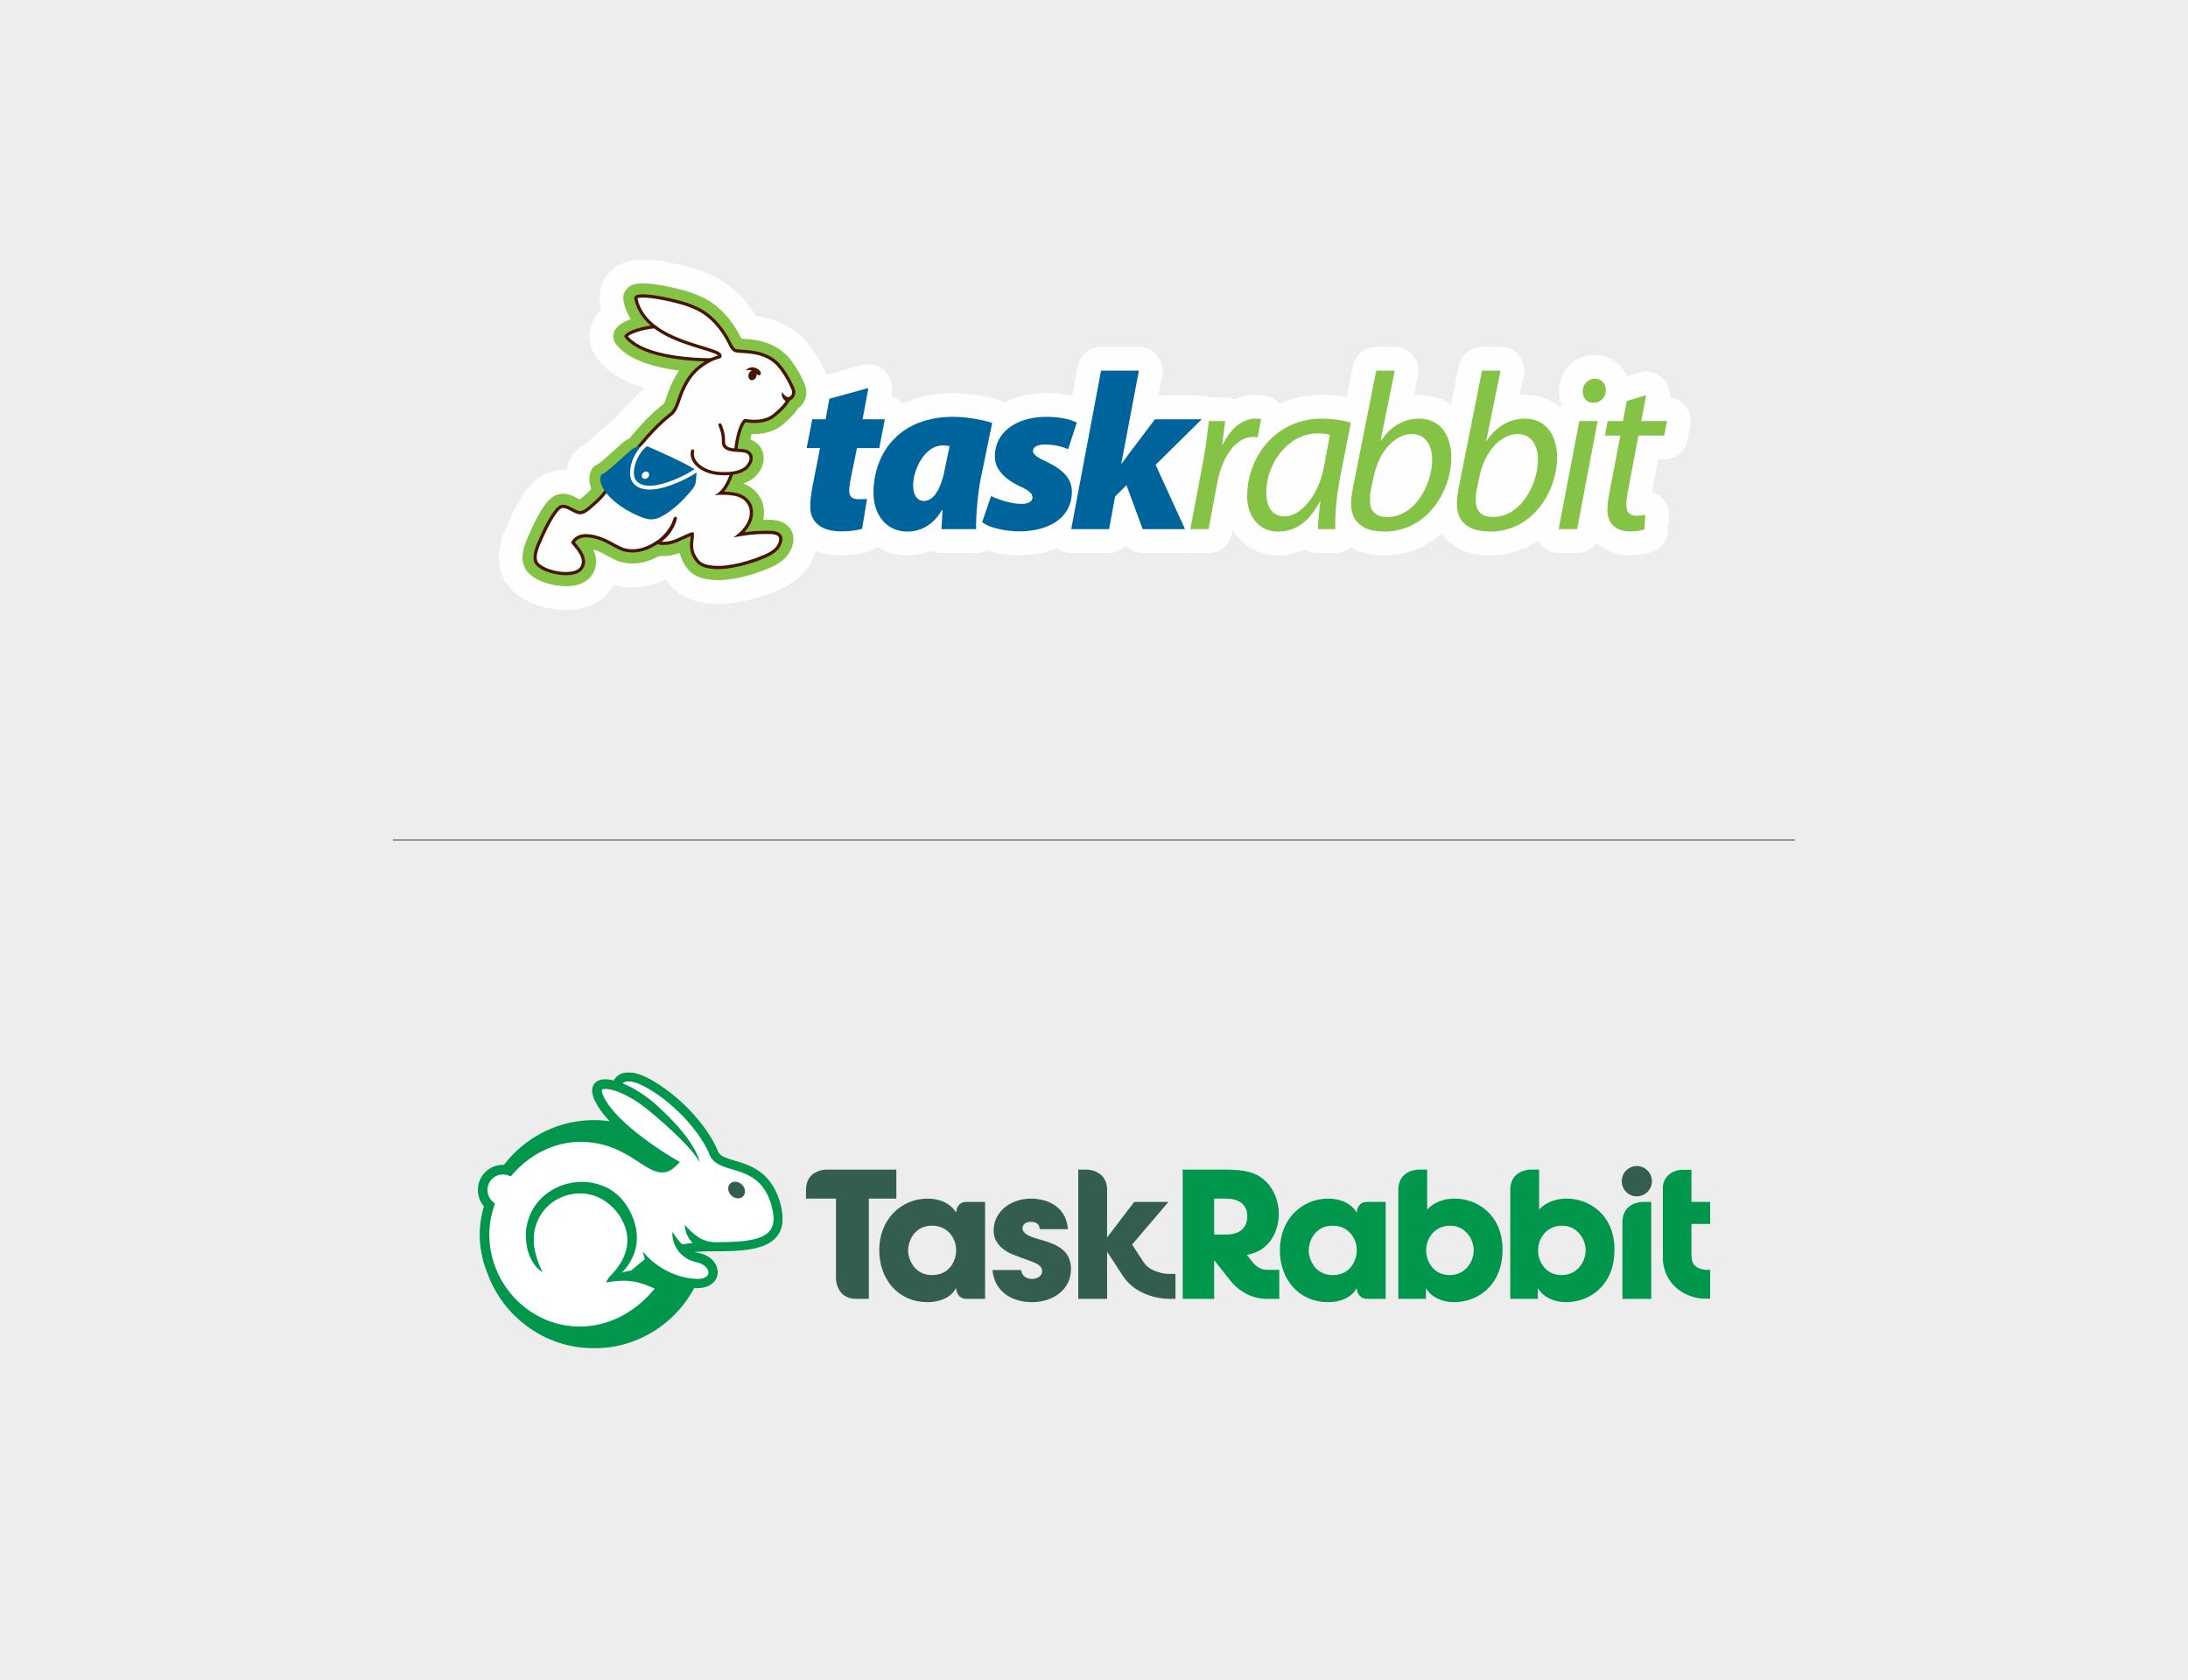 3-taskrabbit-logos-old-new@2x.png